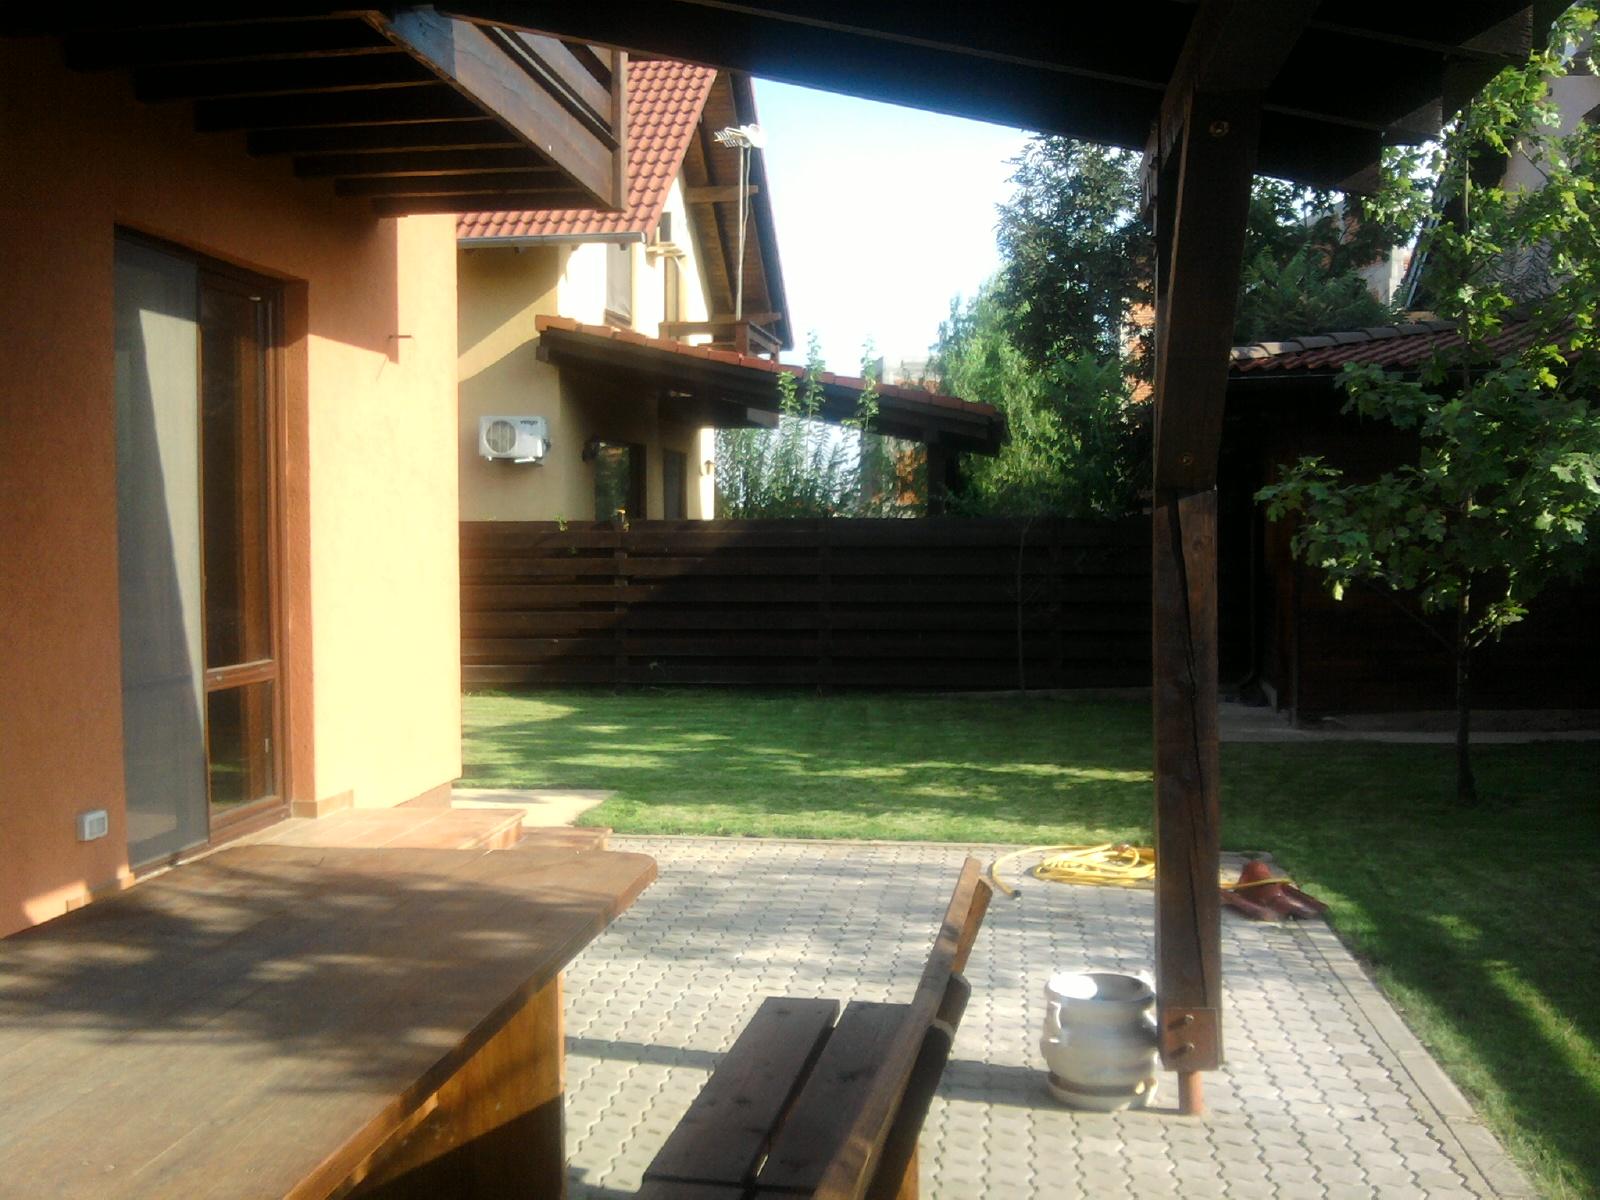 Structuri - case in constructie, constructii din lemn Compart srl - Poza 24